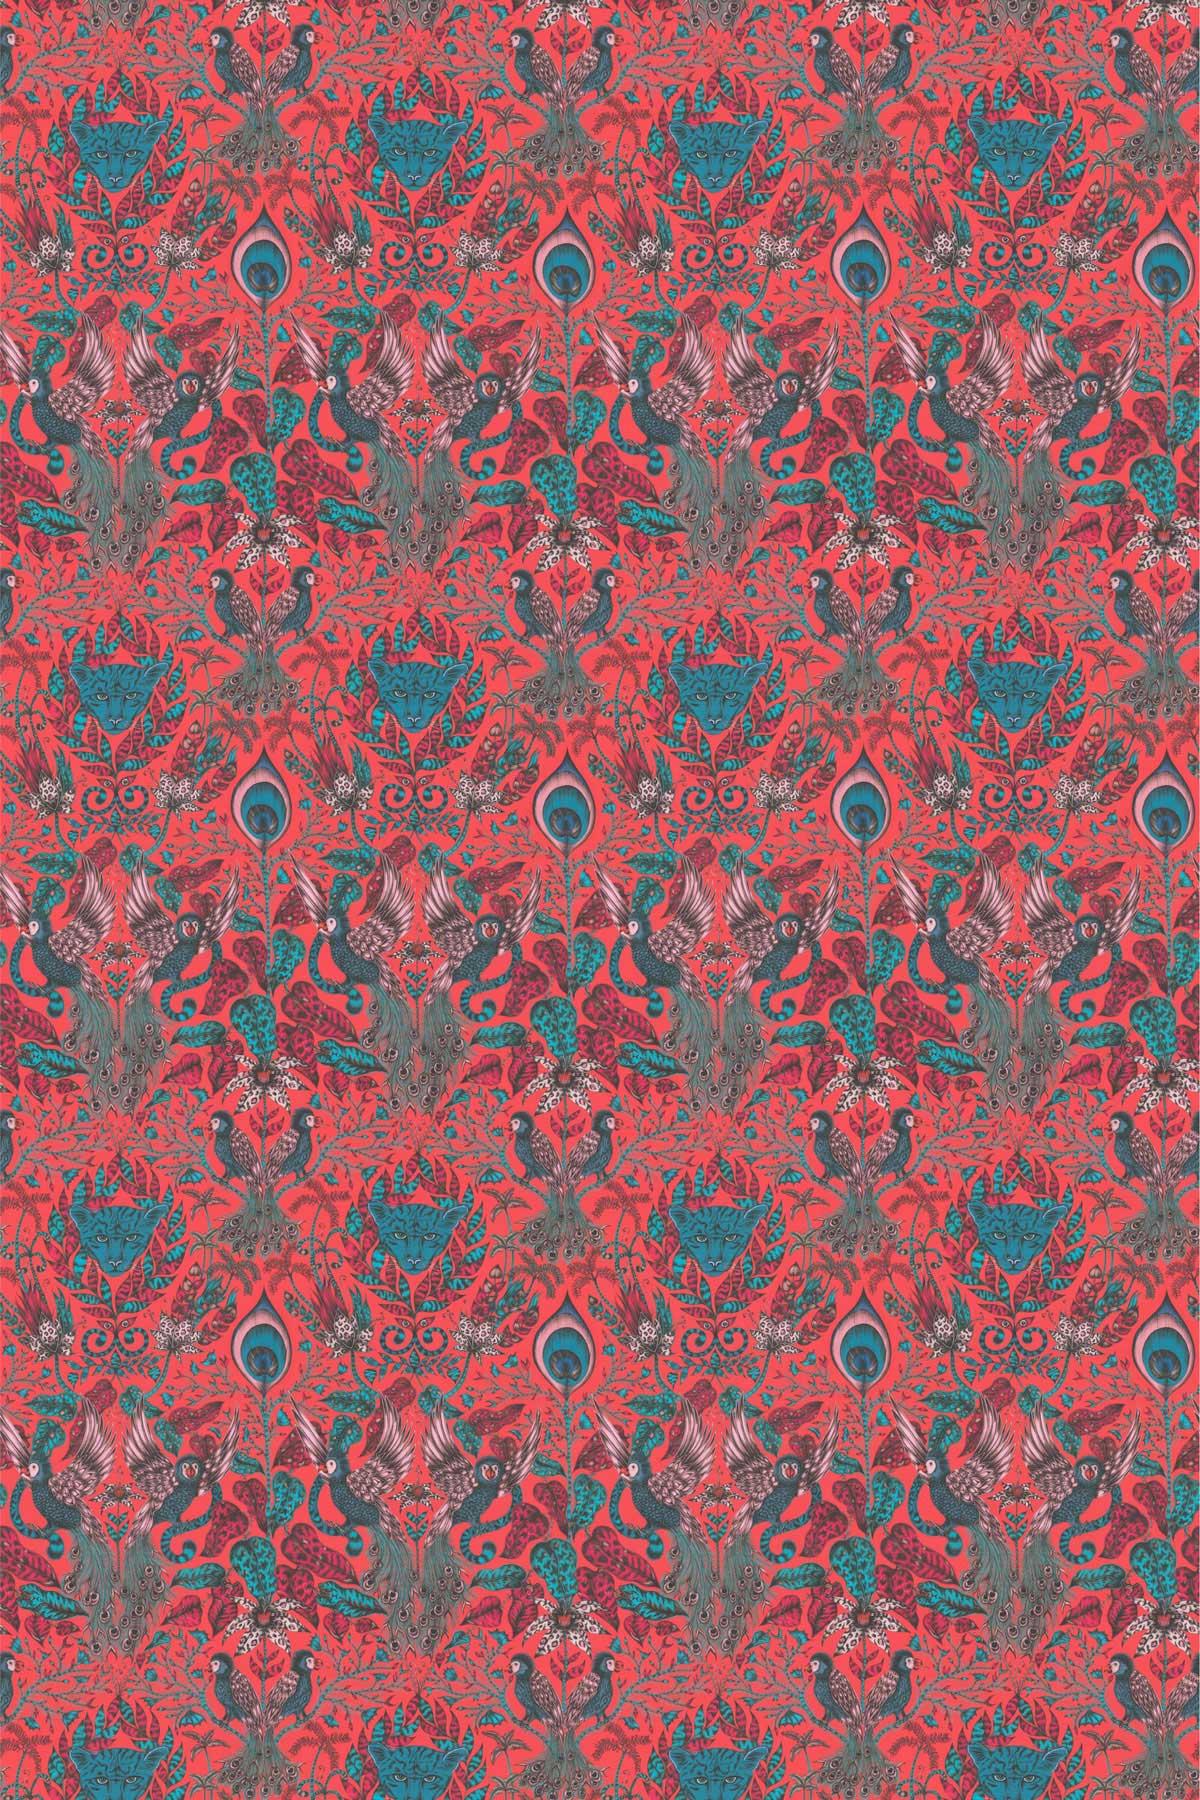 Amazon Fabric - Red - by Emma J Shipley